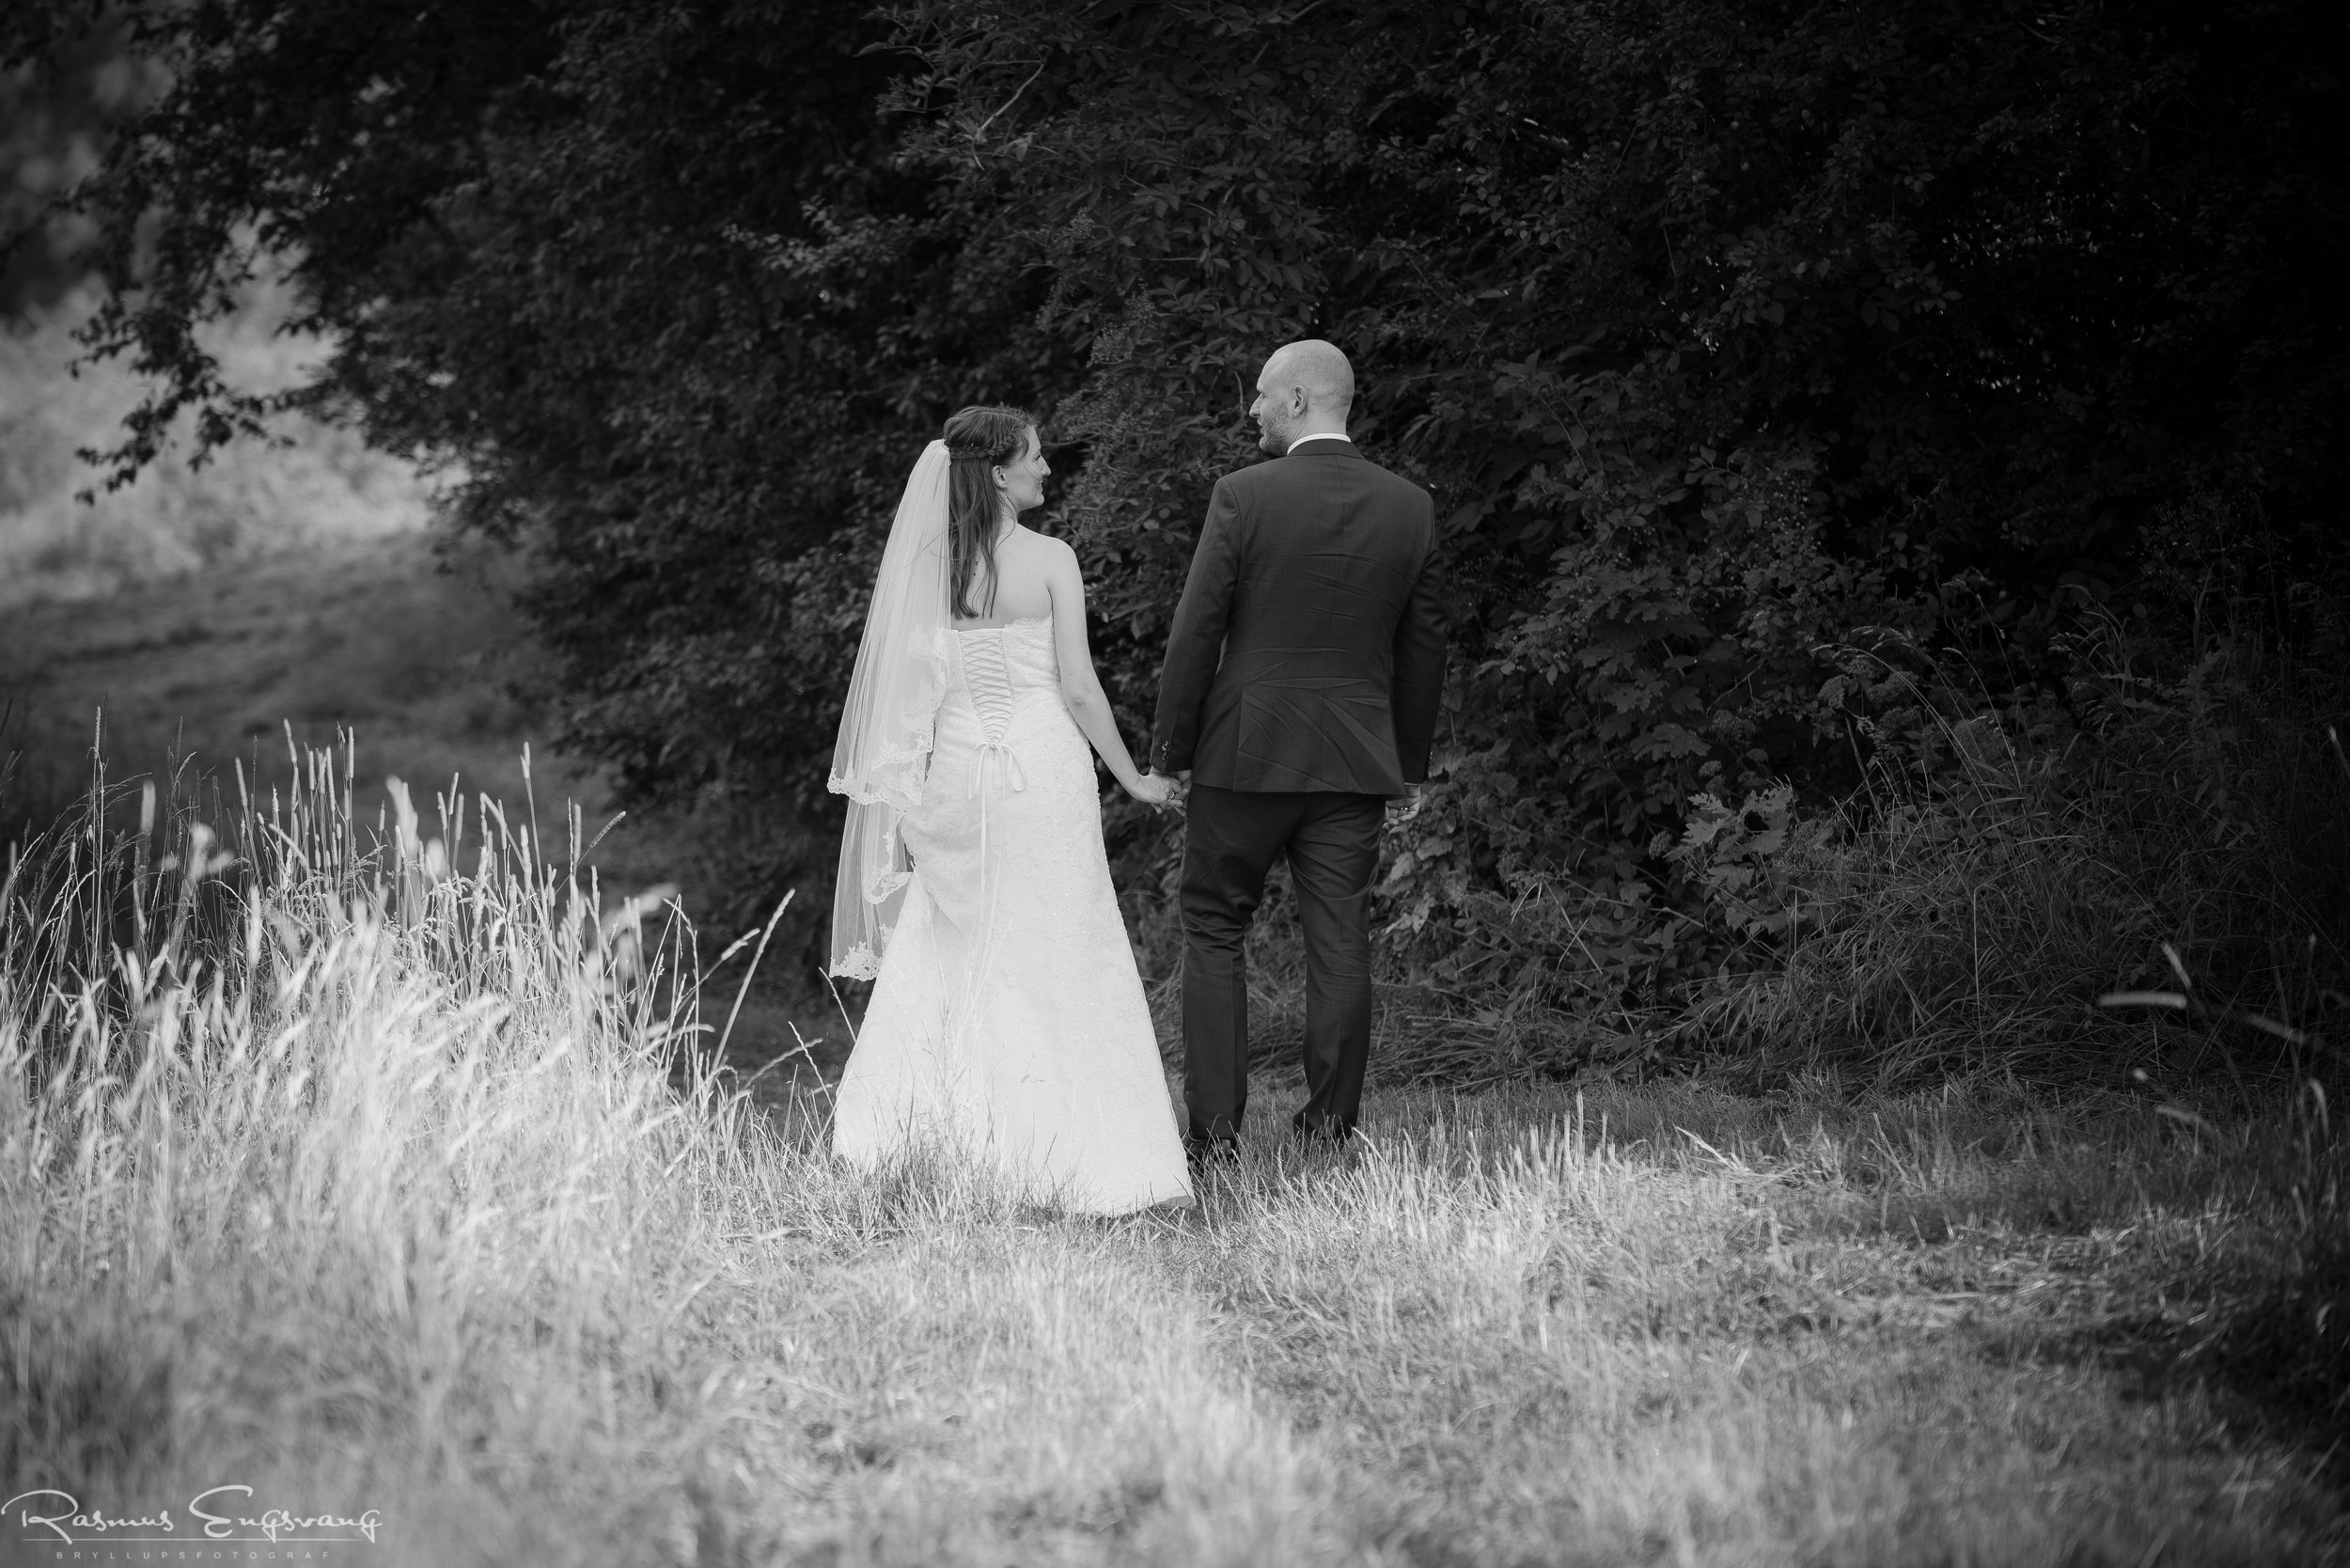 Bryllupsfotograf-København_Sjælland-Ølstykke-Buresø-213.jpg